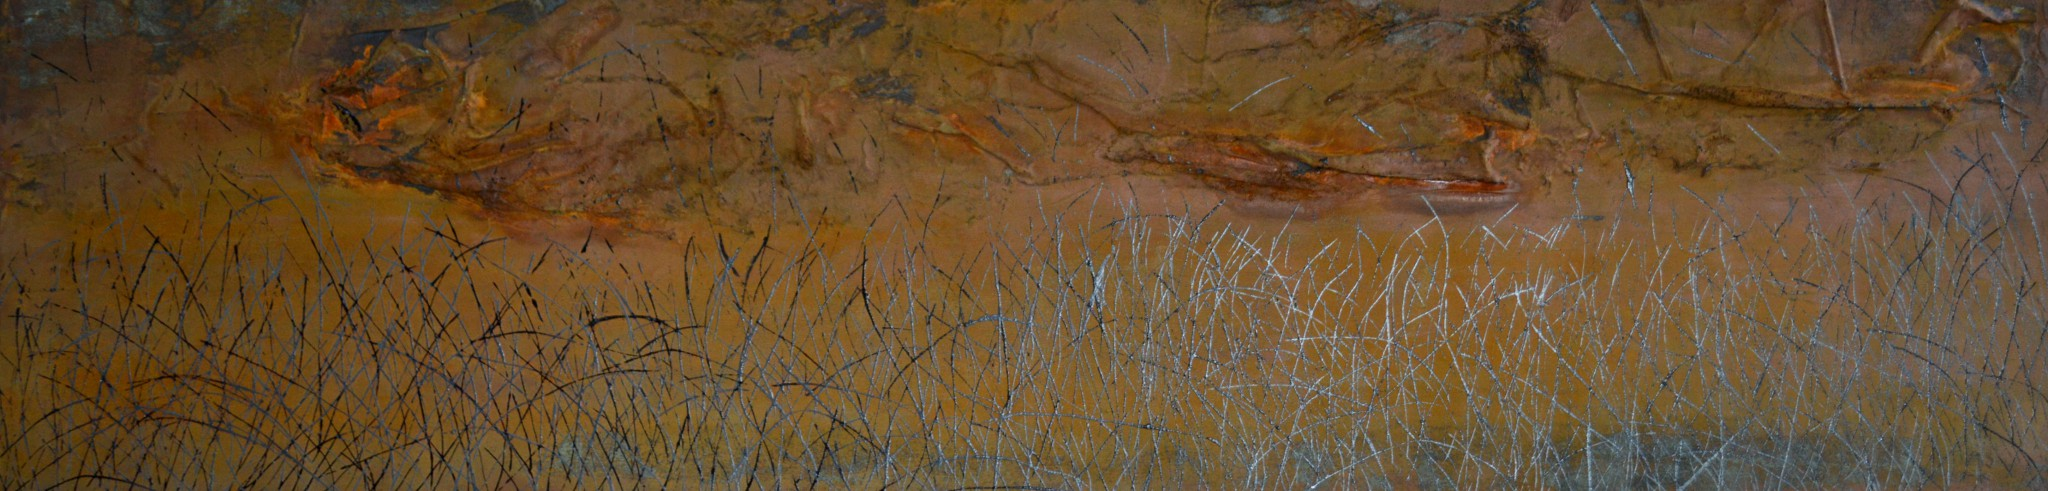 Rost/Lack/Stoffe/Strukturpasten/Leinwand, 200 x 50 cm